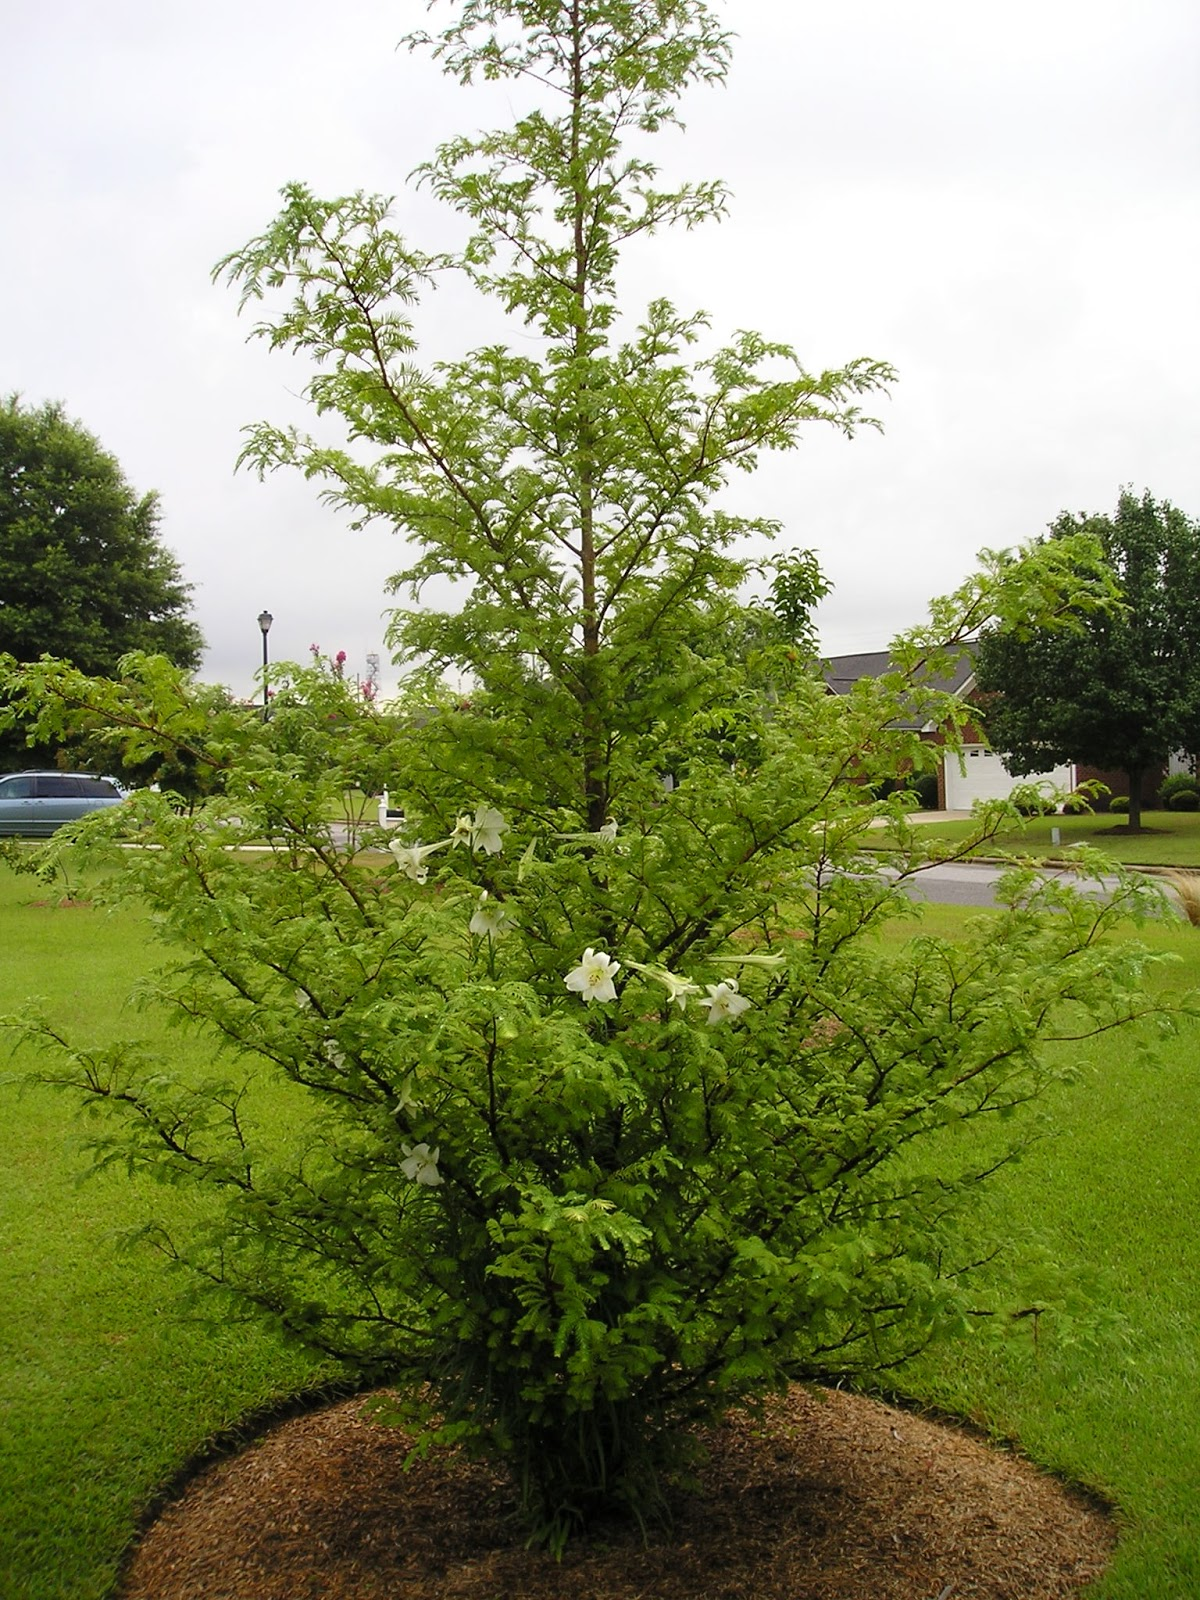 Carol S Garden: Carol's Greenville NC Garden: Blooming Dawn Redwood?